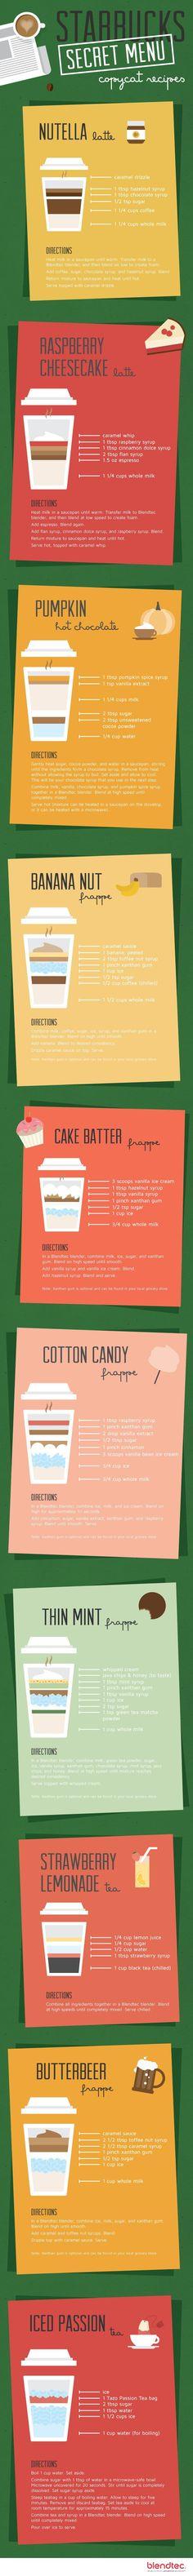 #Starbucks Secret Menu Copy Cat Recipes - make your own Starbucks at home & save!  #coffee #recipes